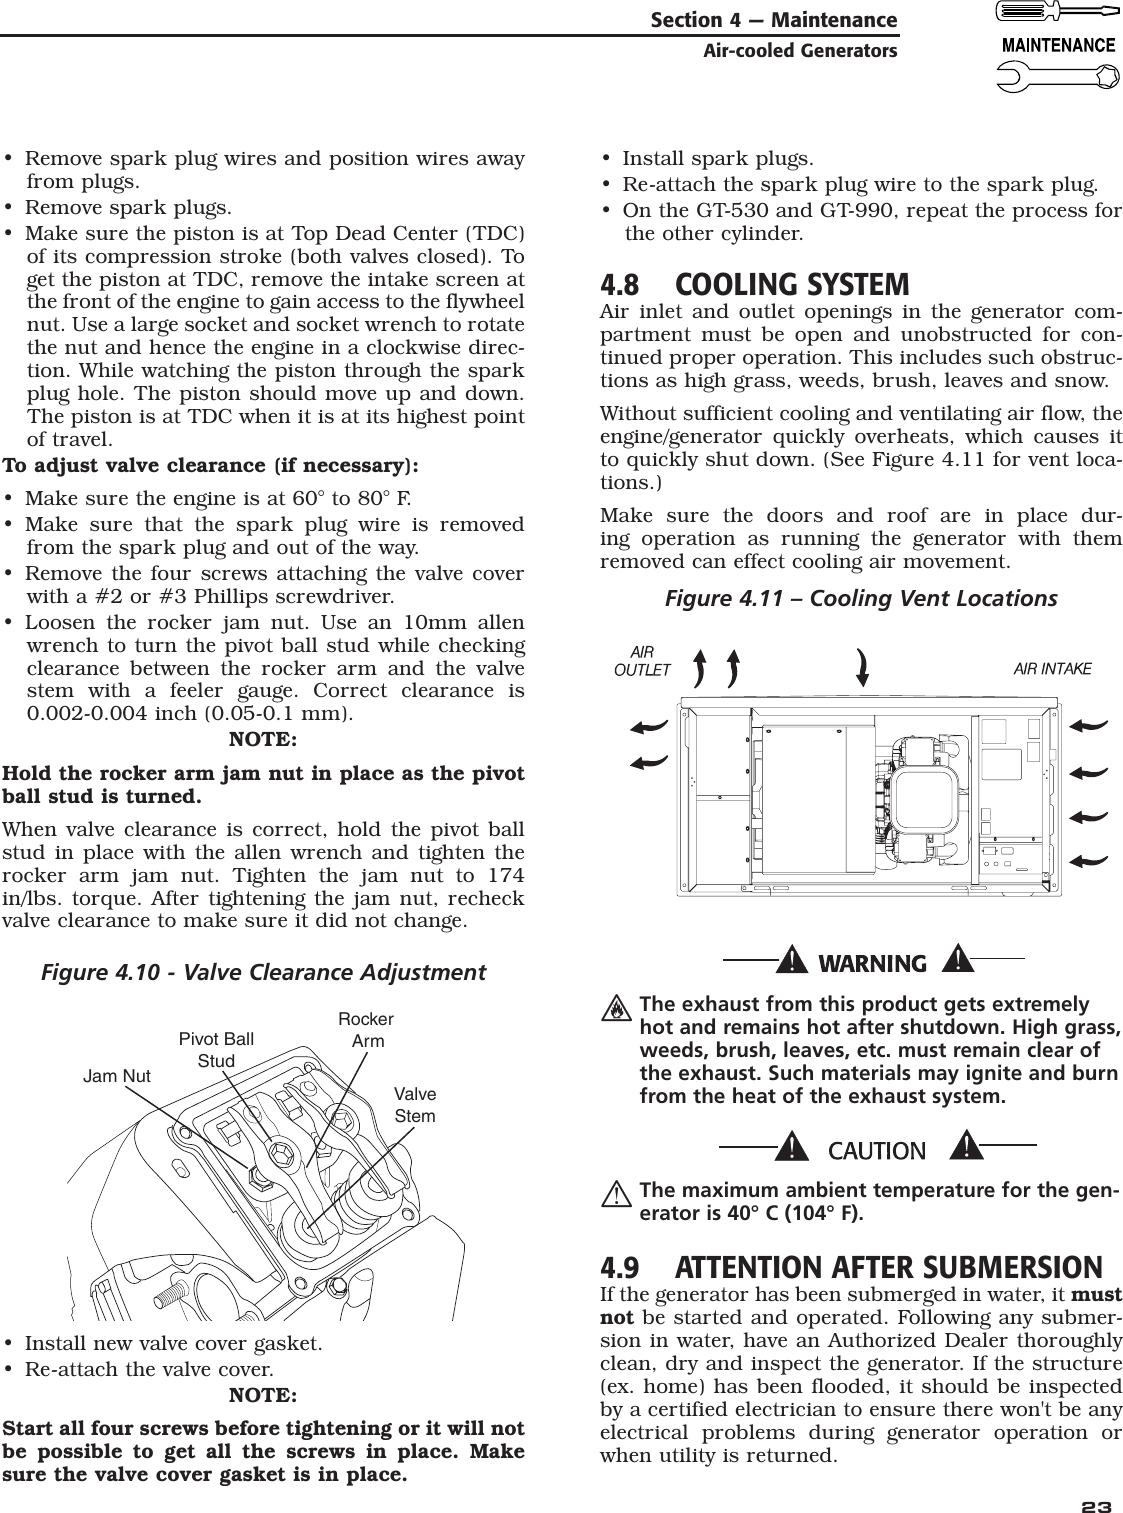 Guardian Technologies 5240 Users Manual 0F9421revC